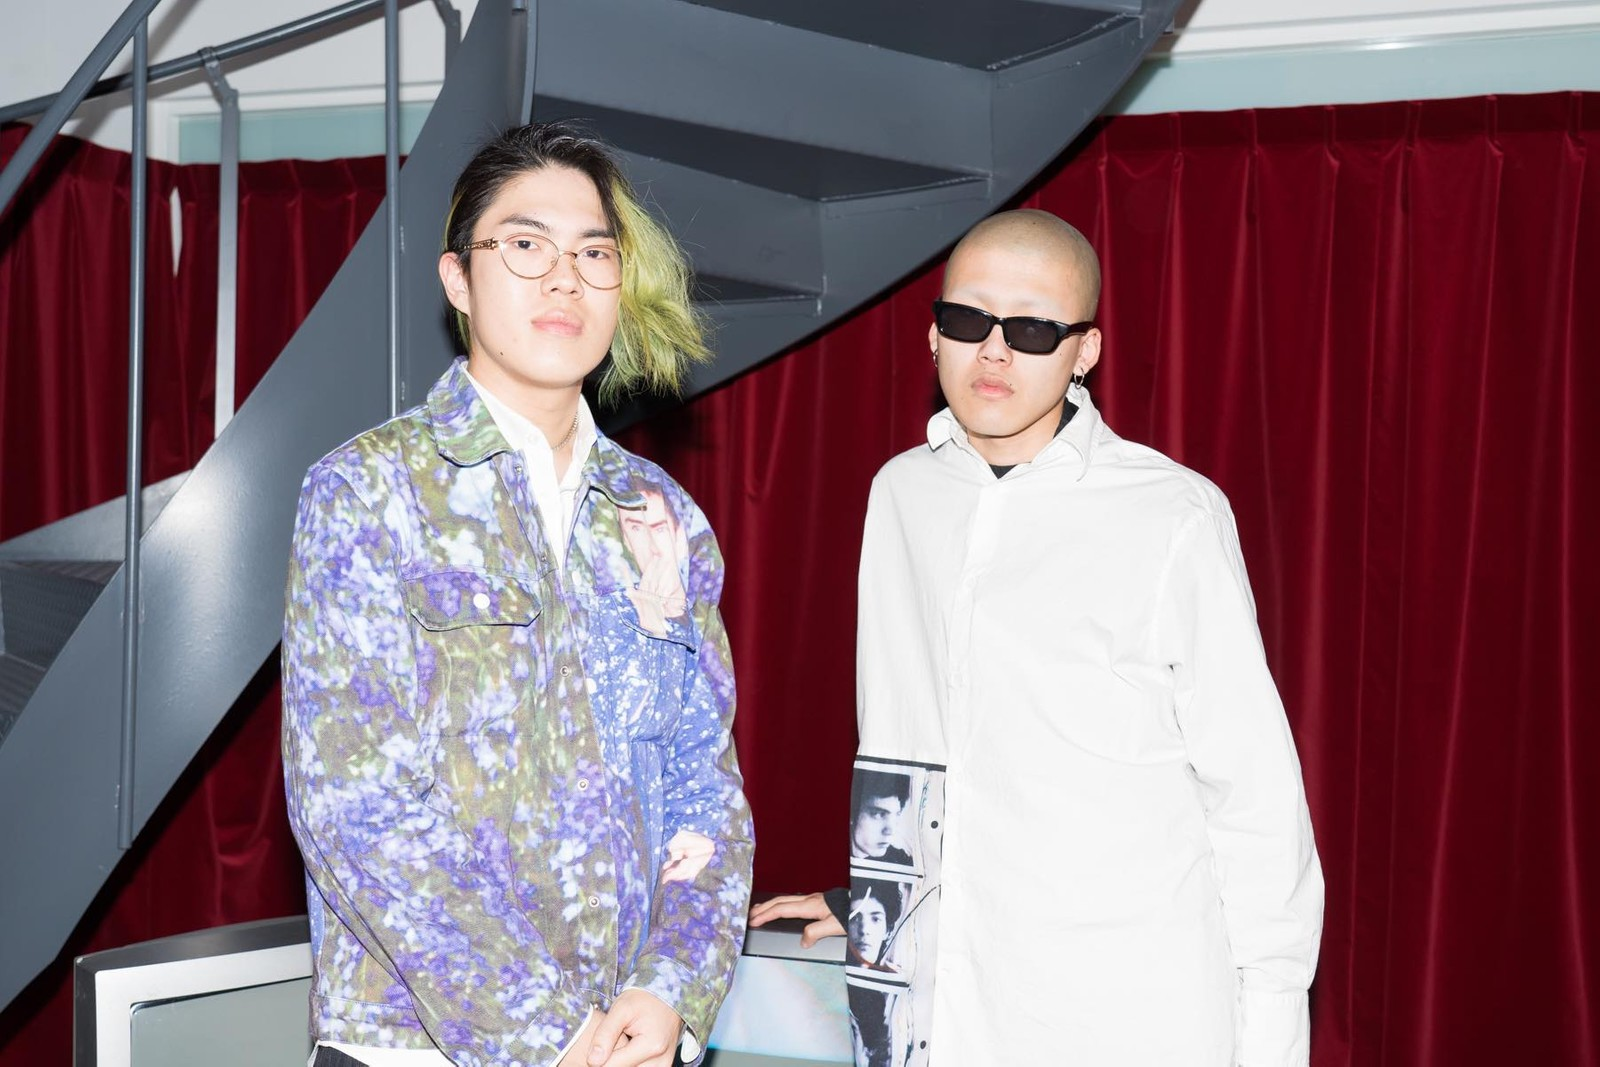 """LIFE COACH 東京"" 閉幕前夜に行われたサプライズライブを一挙プレイバック TAKUYA KAMIOKAの息を呑むライブペインティングと、KID FRESINO、JJJ、STUTSらのDJプレイでヘッズたちのボルテージは最高潮に"